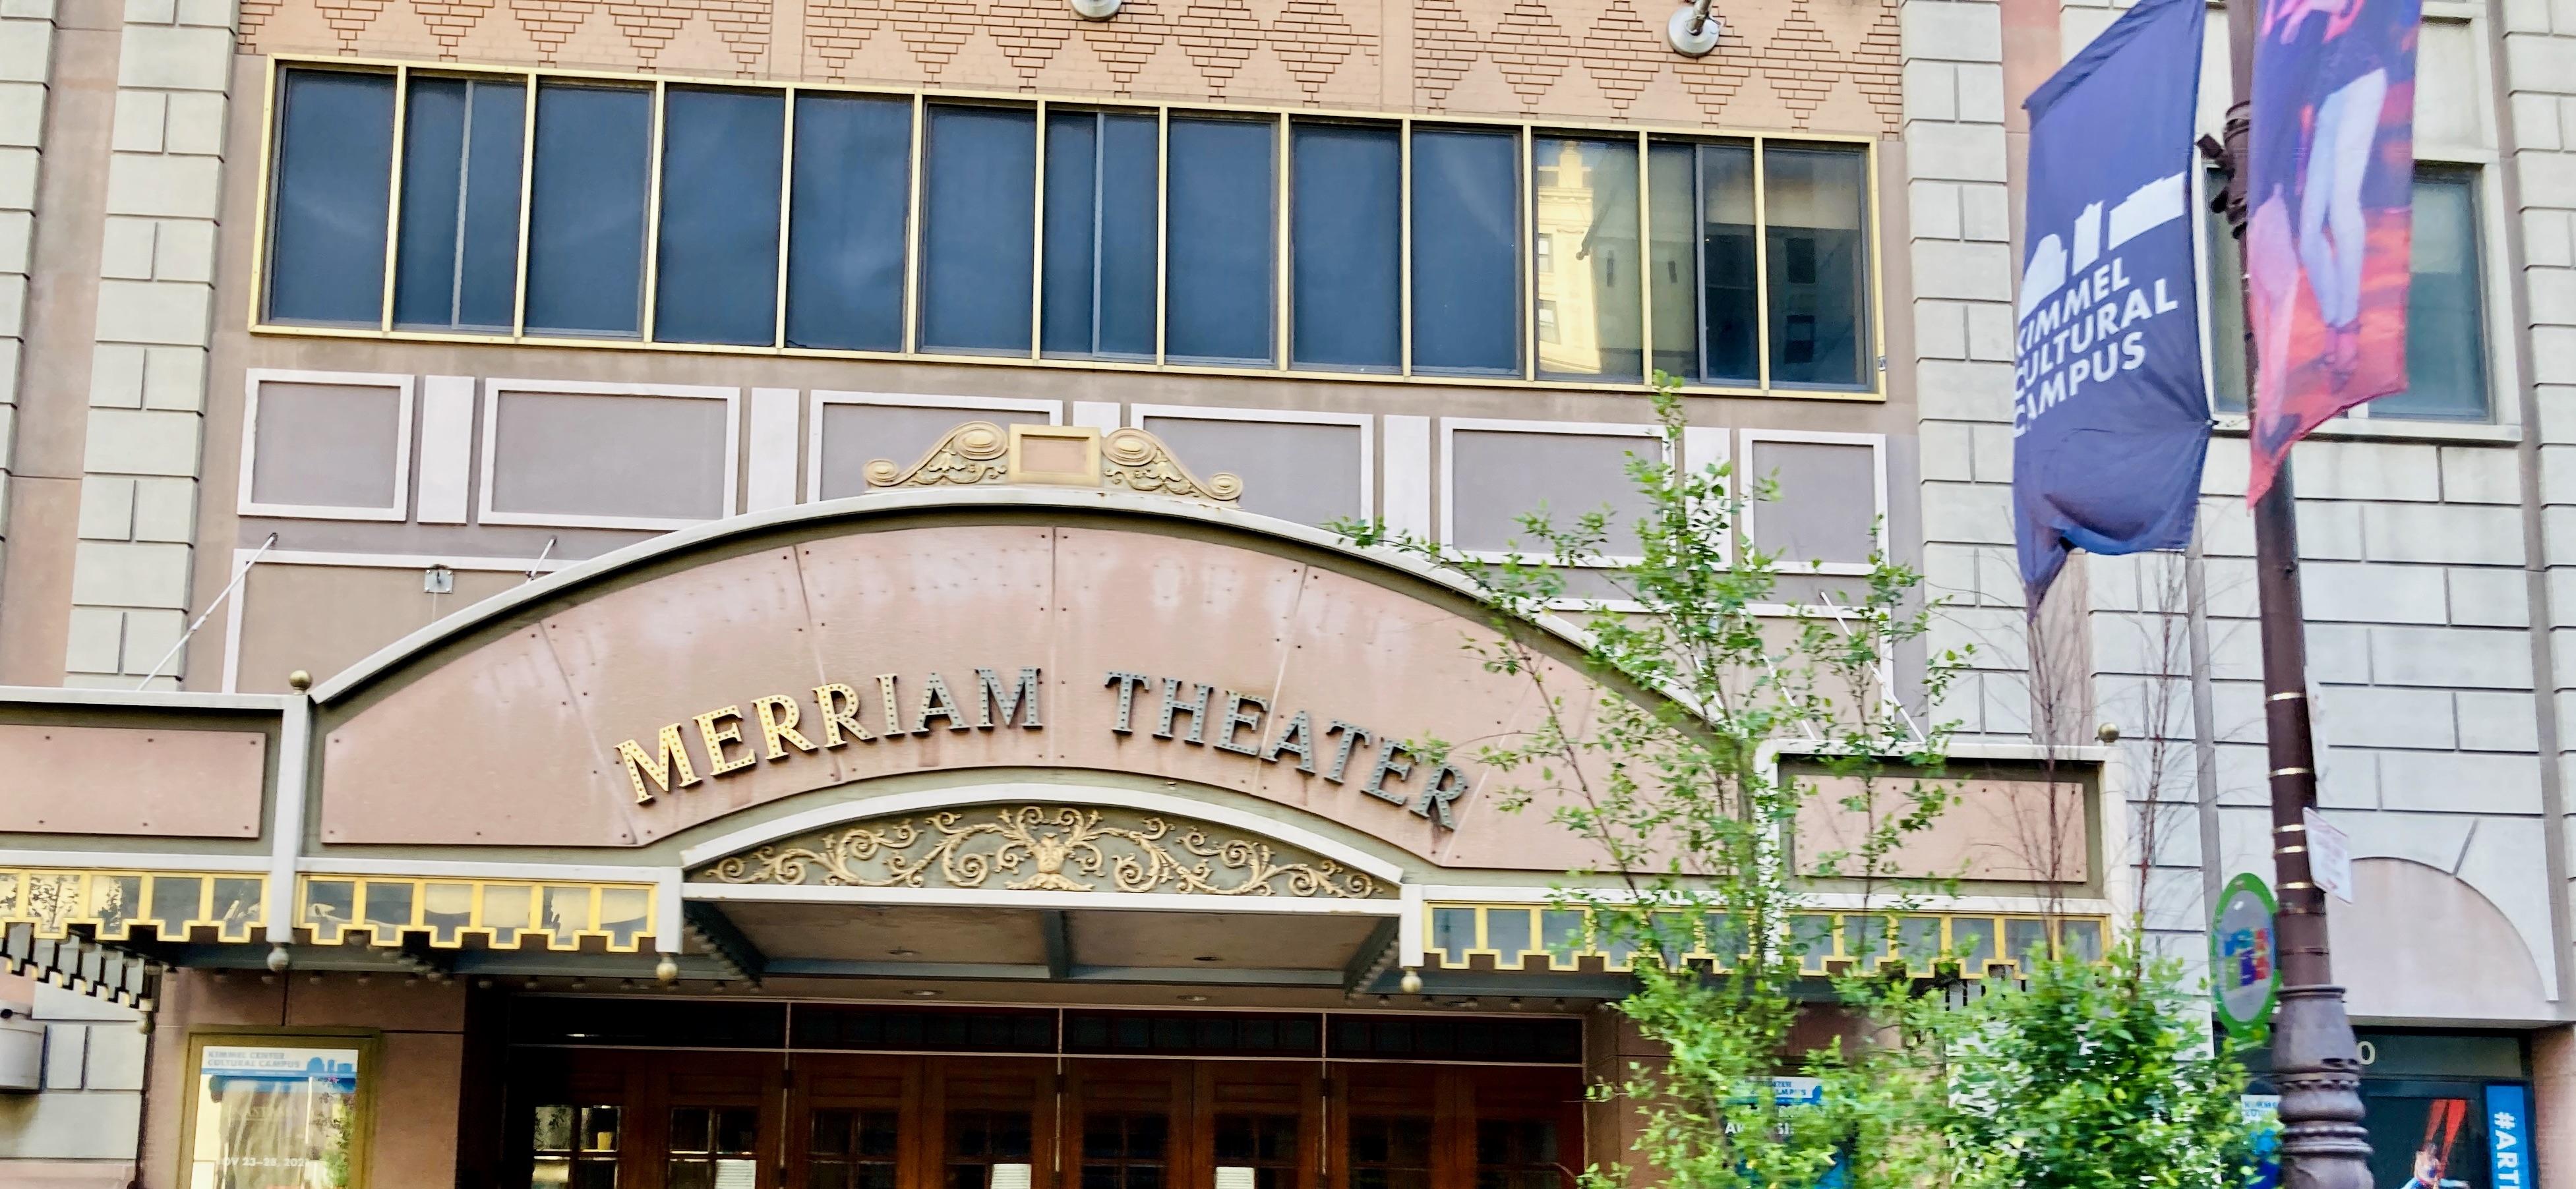 Merriam Theater in Center City, PA